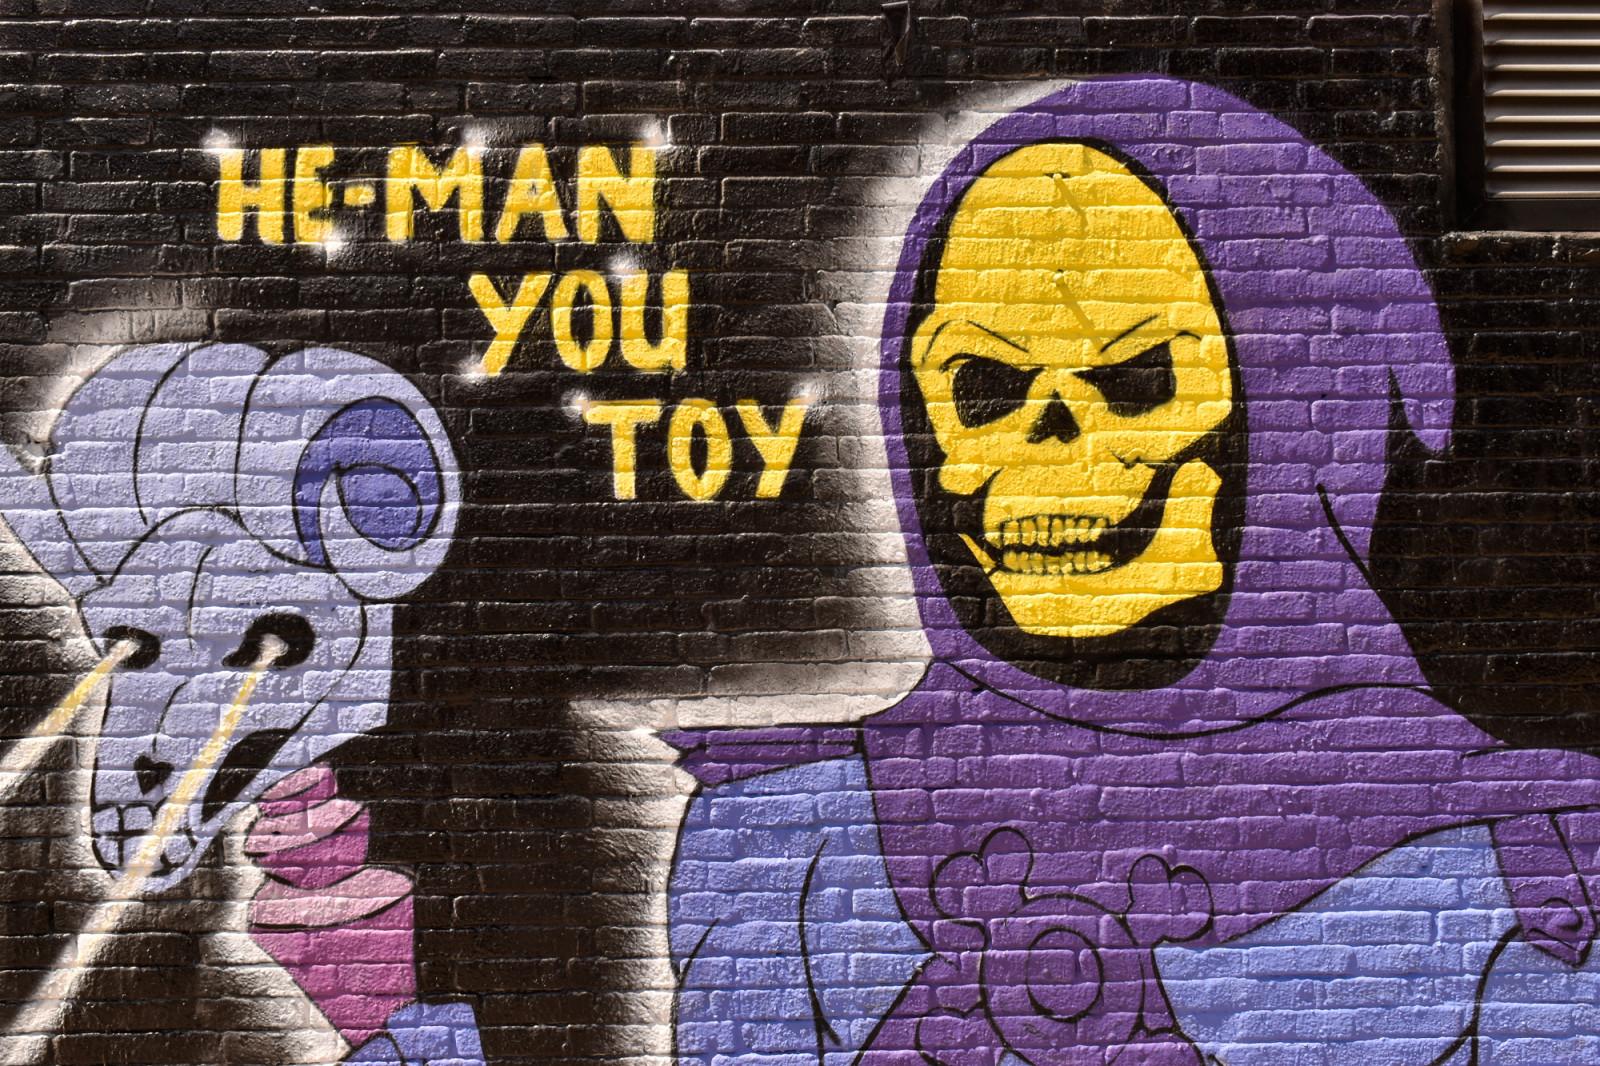 He-man you toy graffiti street art Amsterdam